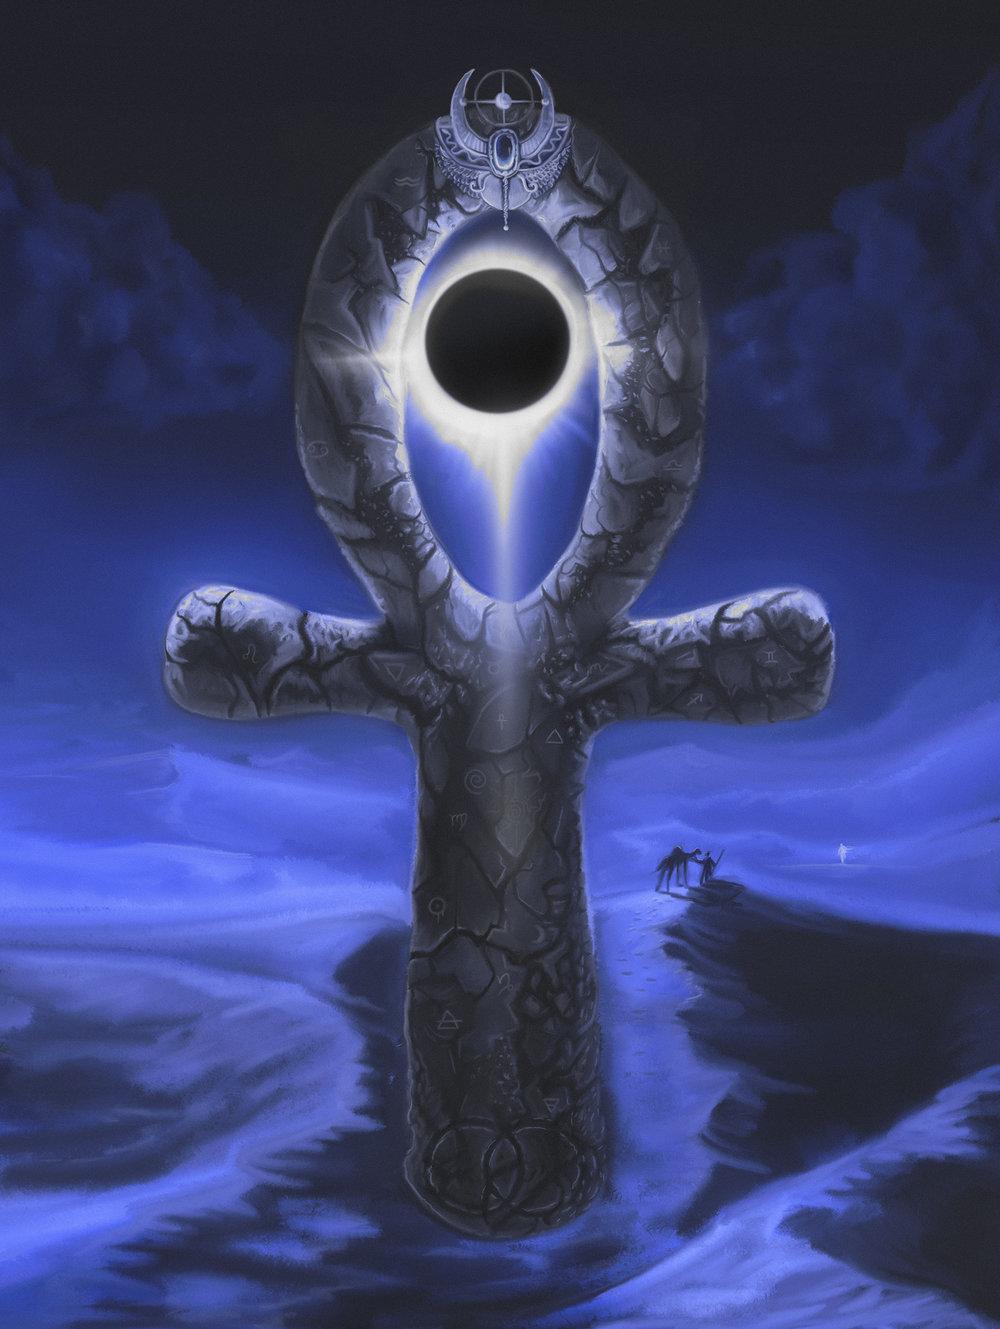 ankh blue moon.jpg